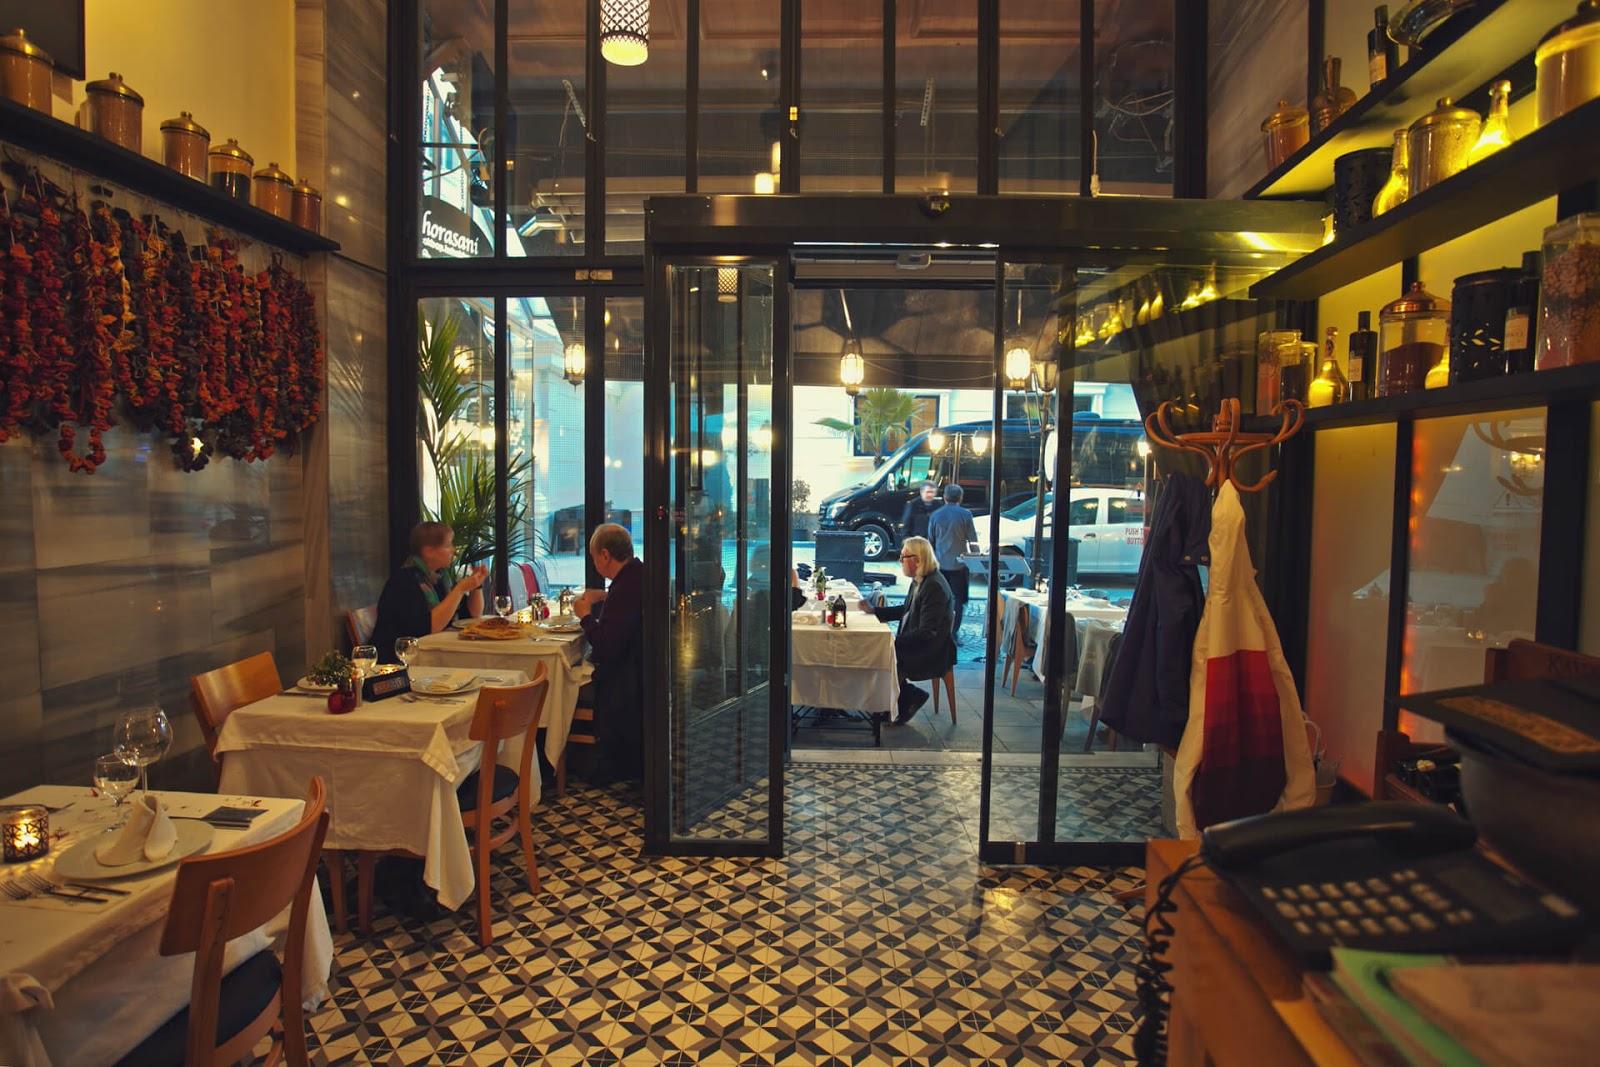 Khorasani Kebap Restoranı (Grill House)